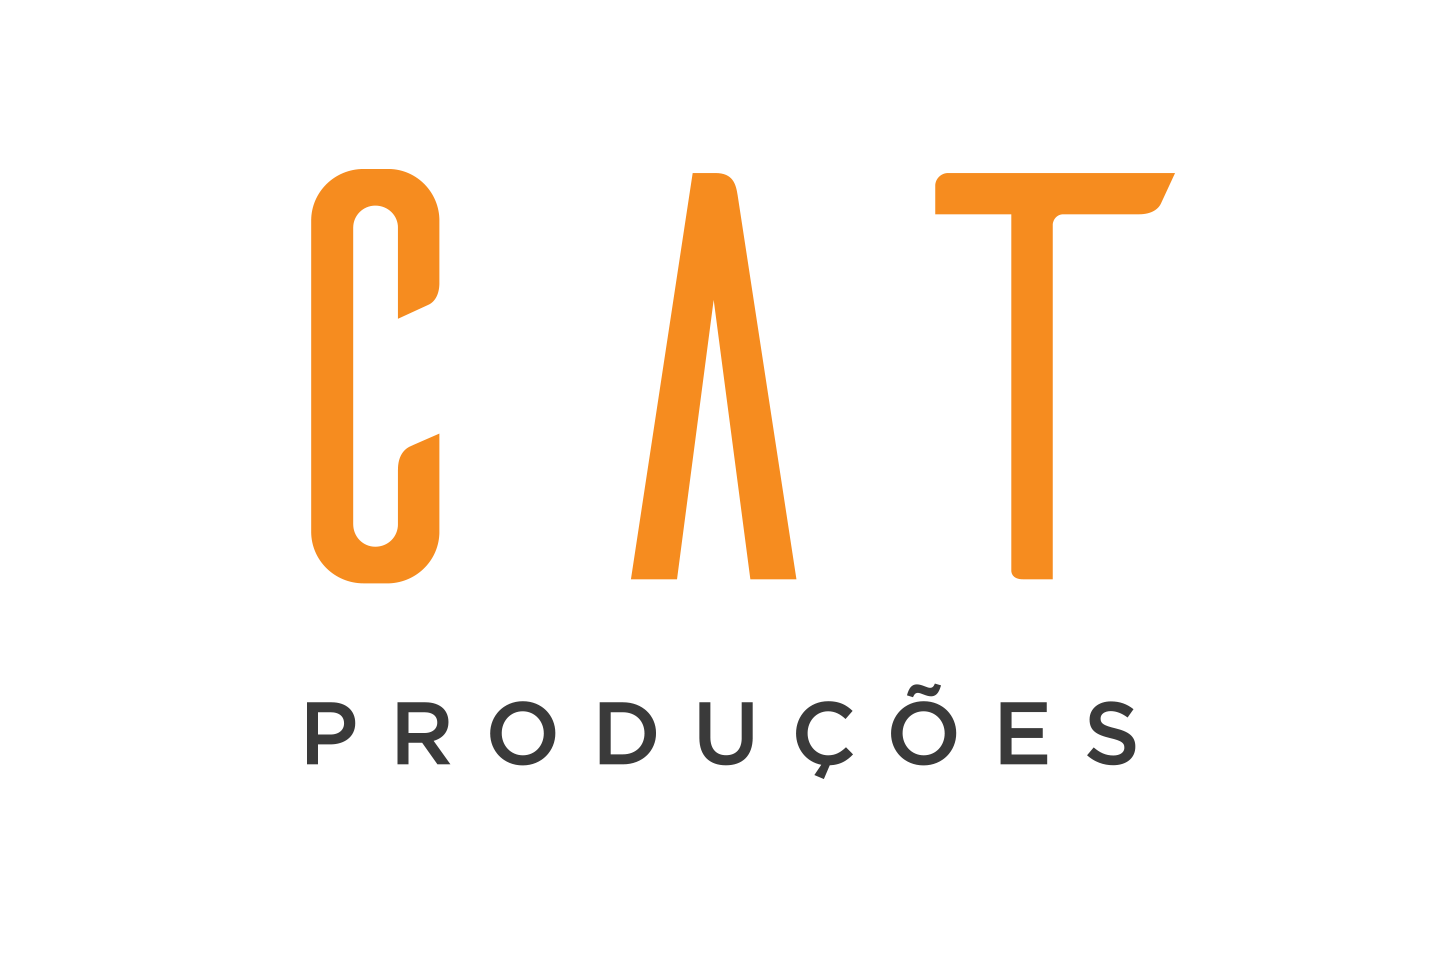 CAT_PRODUCOES_LOGO.png